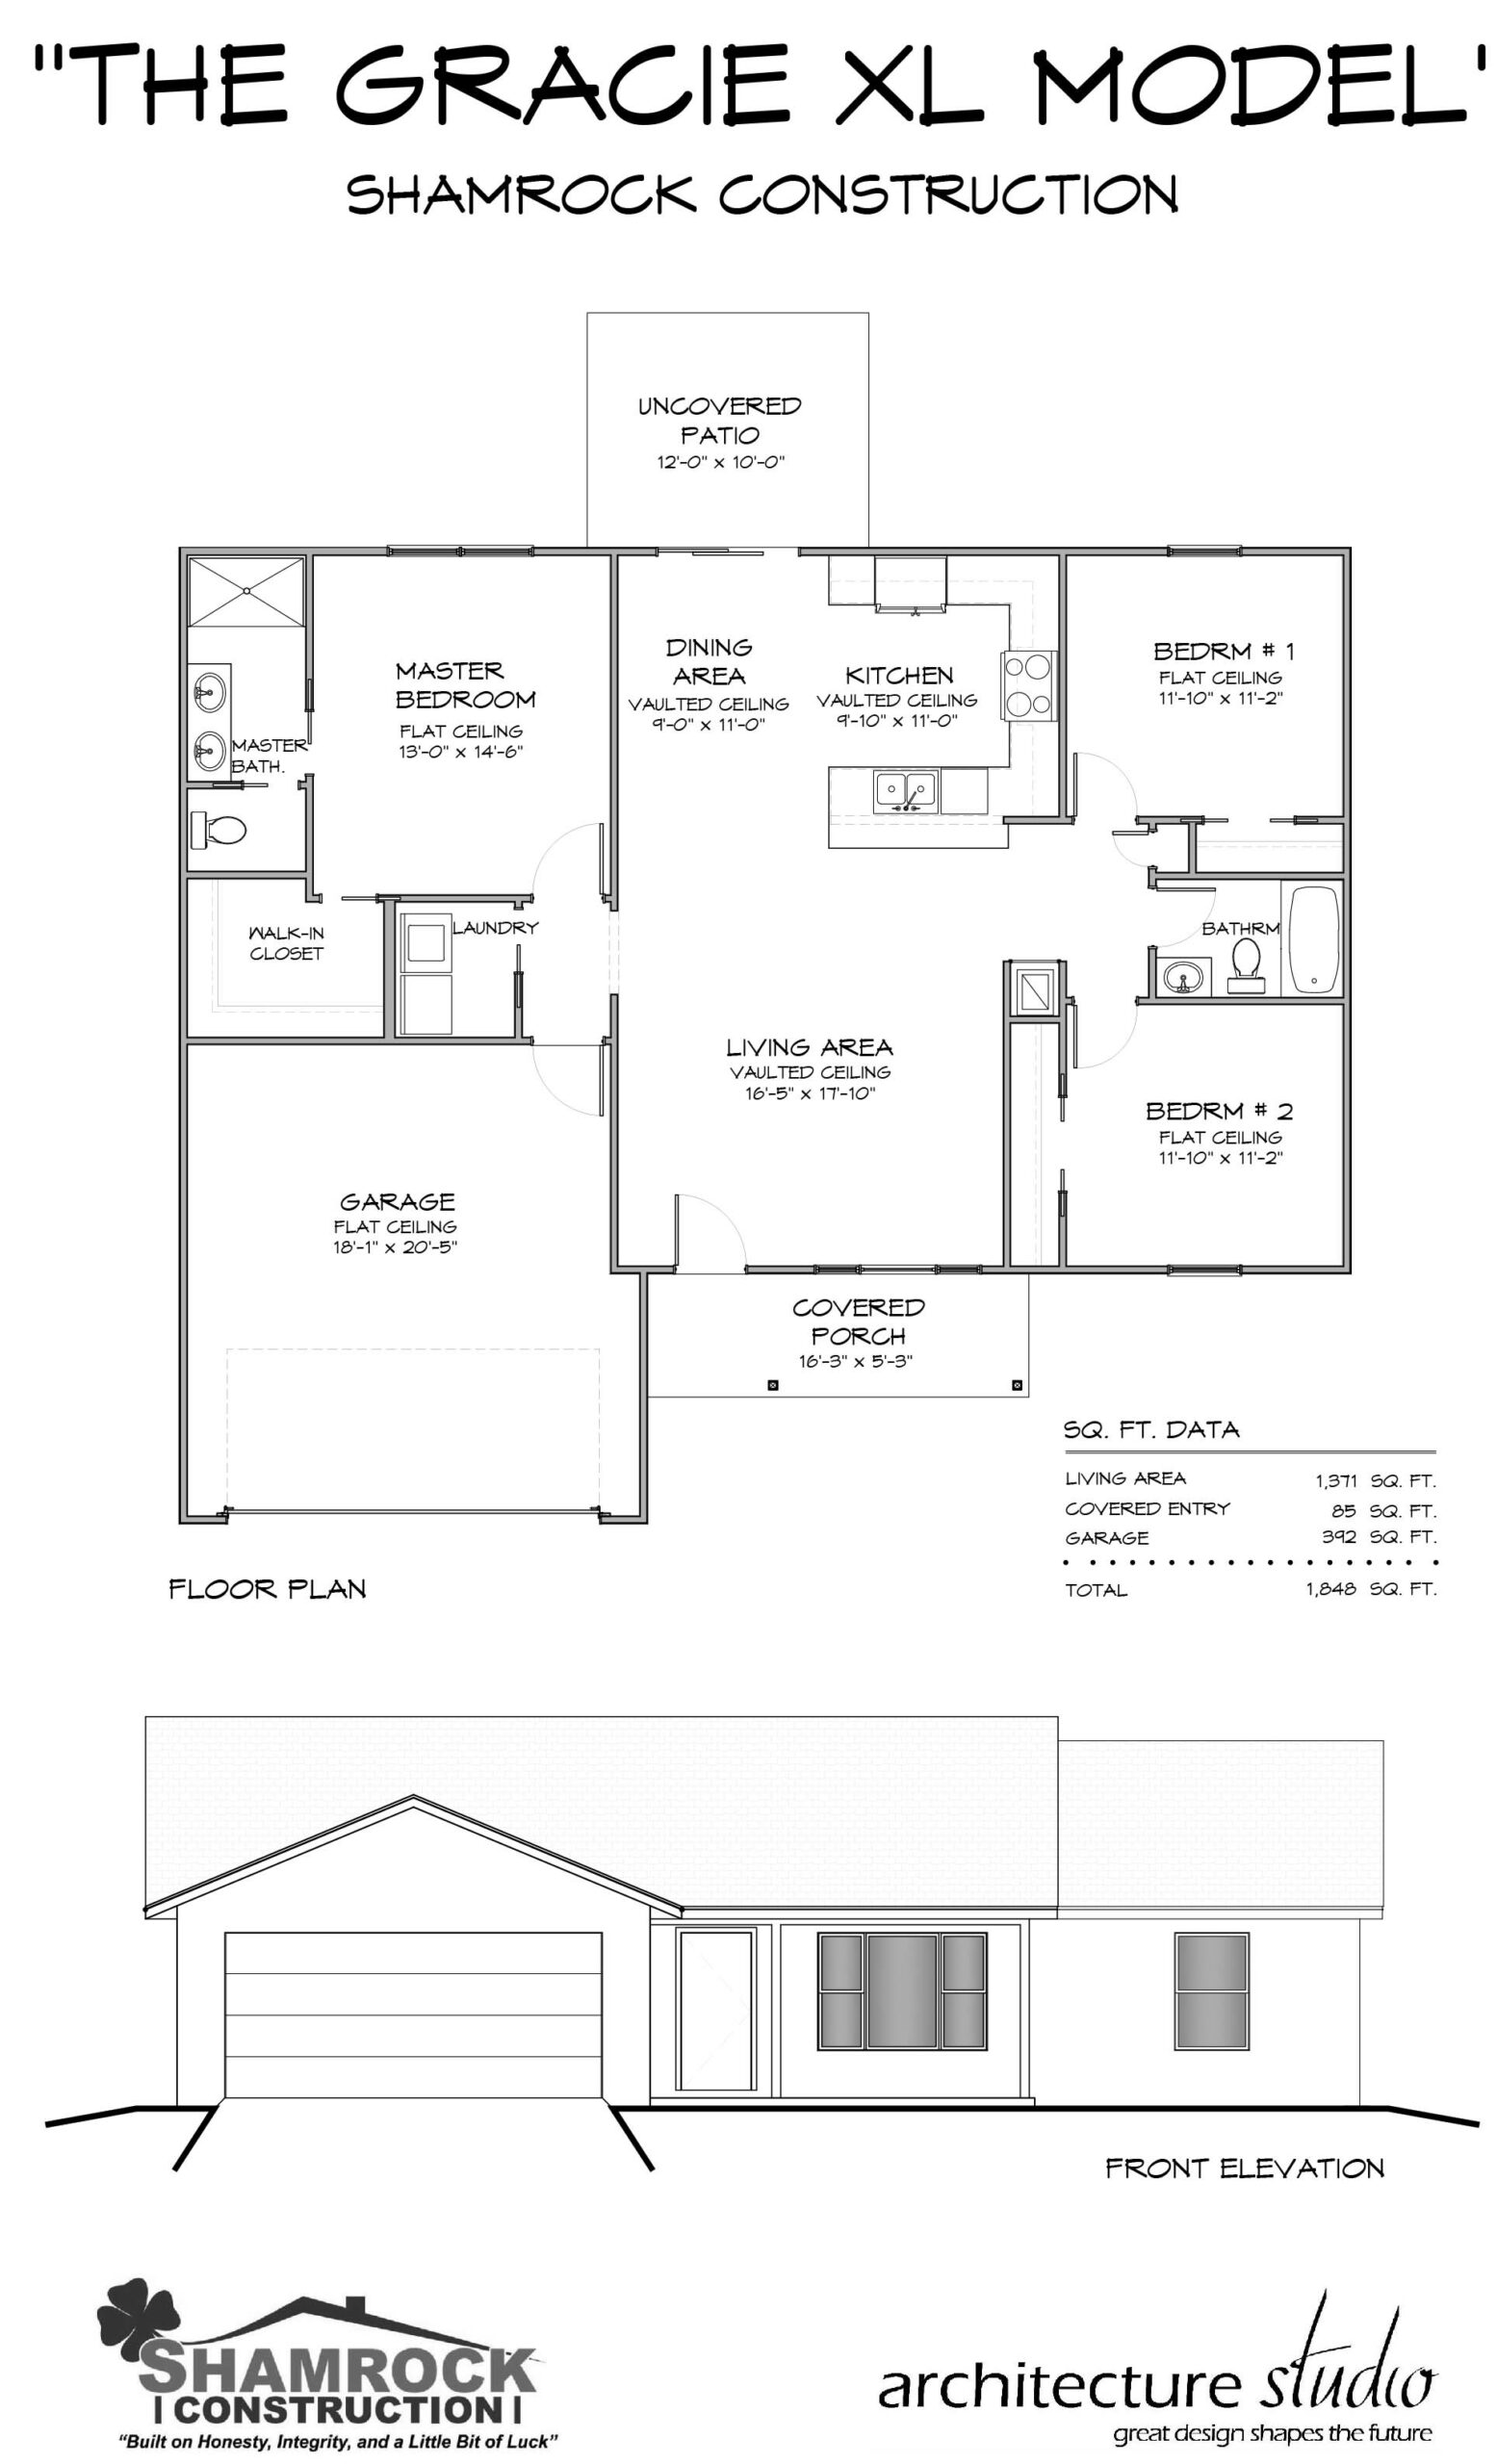 Gracie XL Model Home - Shamrock Construction